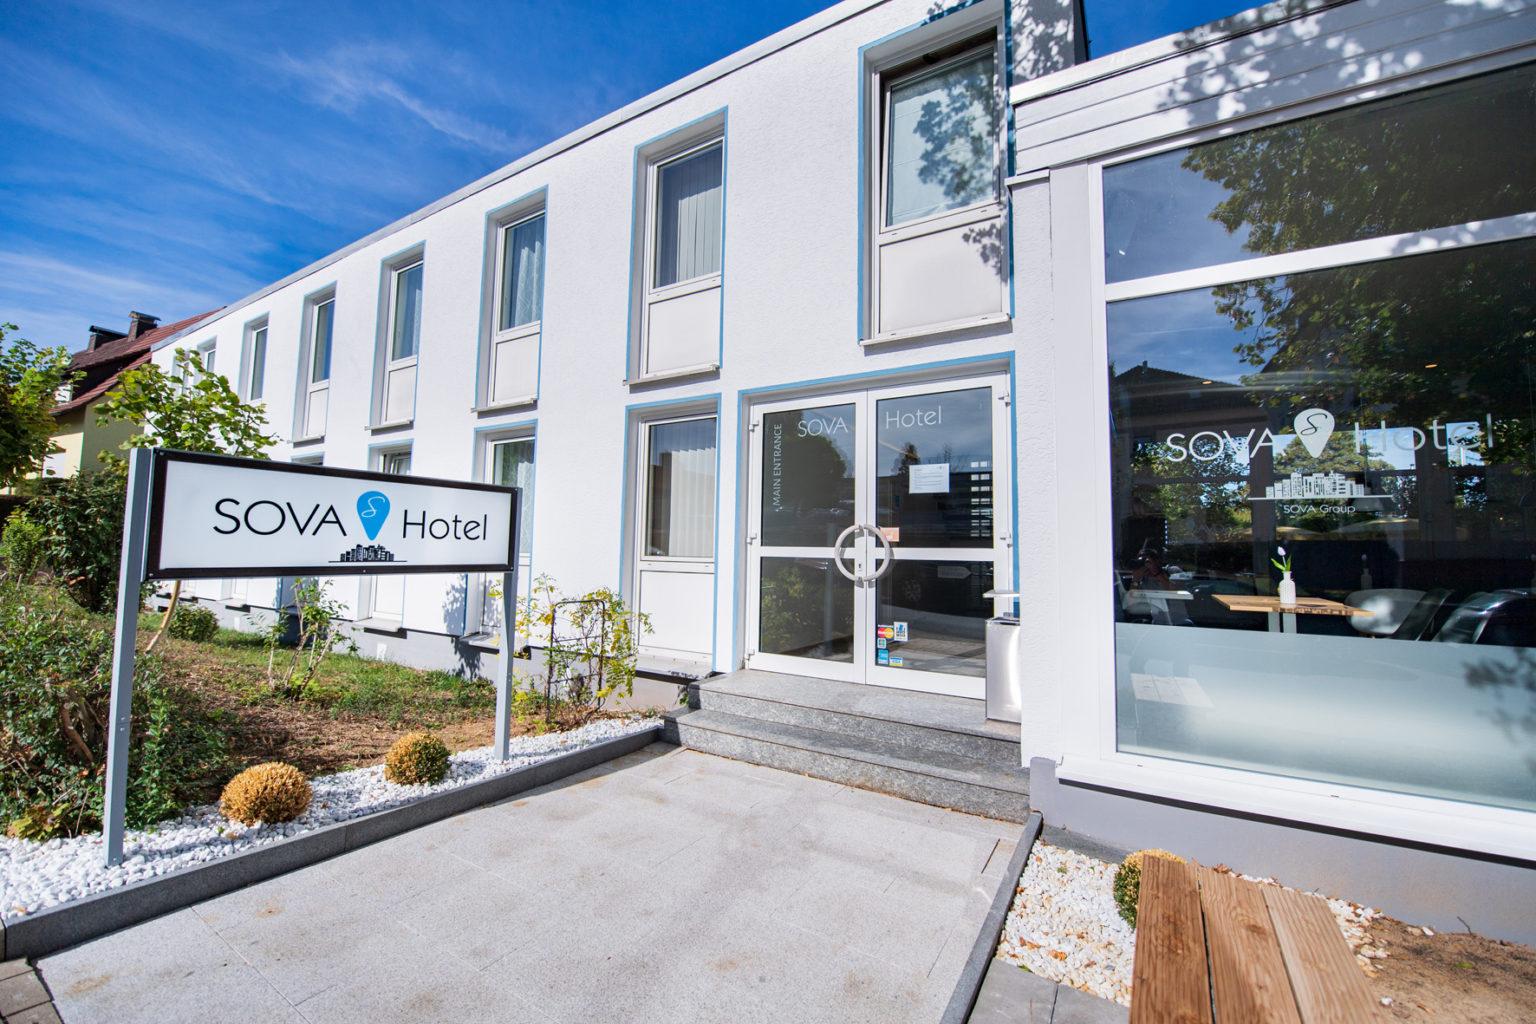 SOVA Hotel